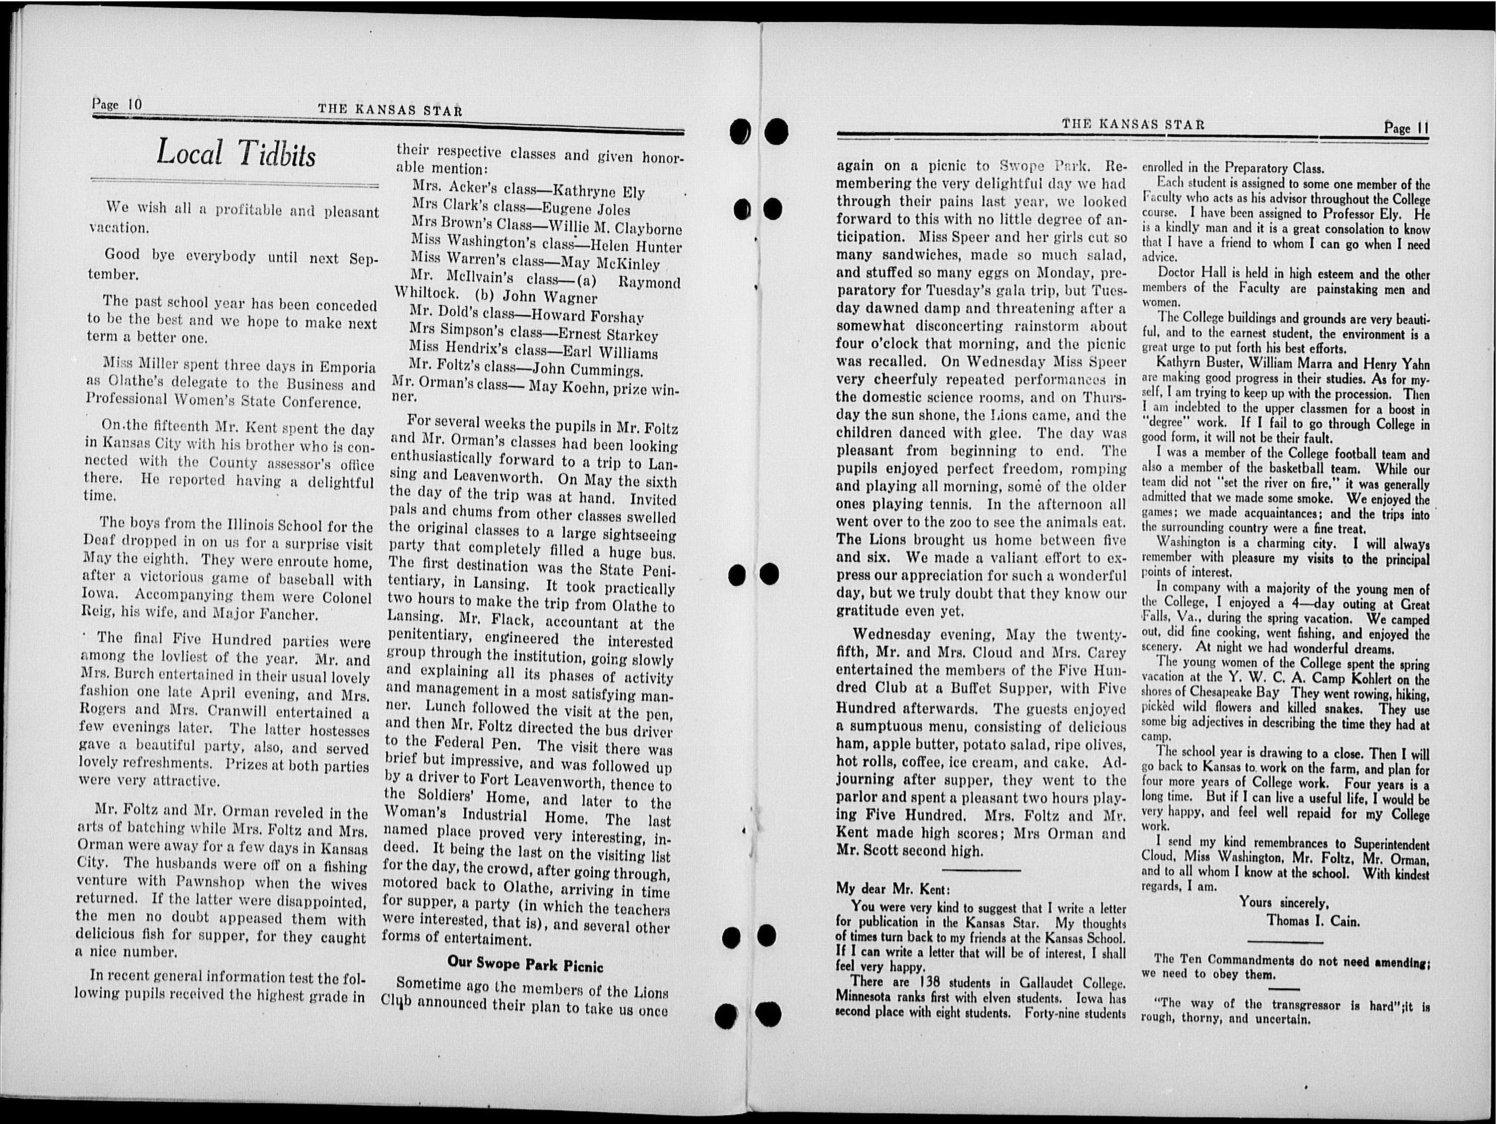 The Kansas Star, volume 50, number 16 - 10-11